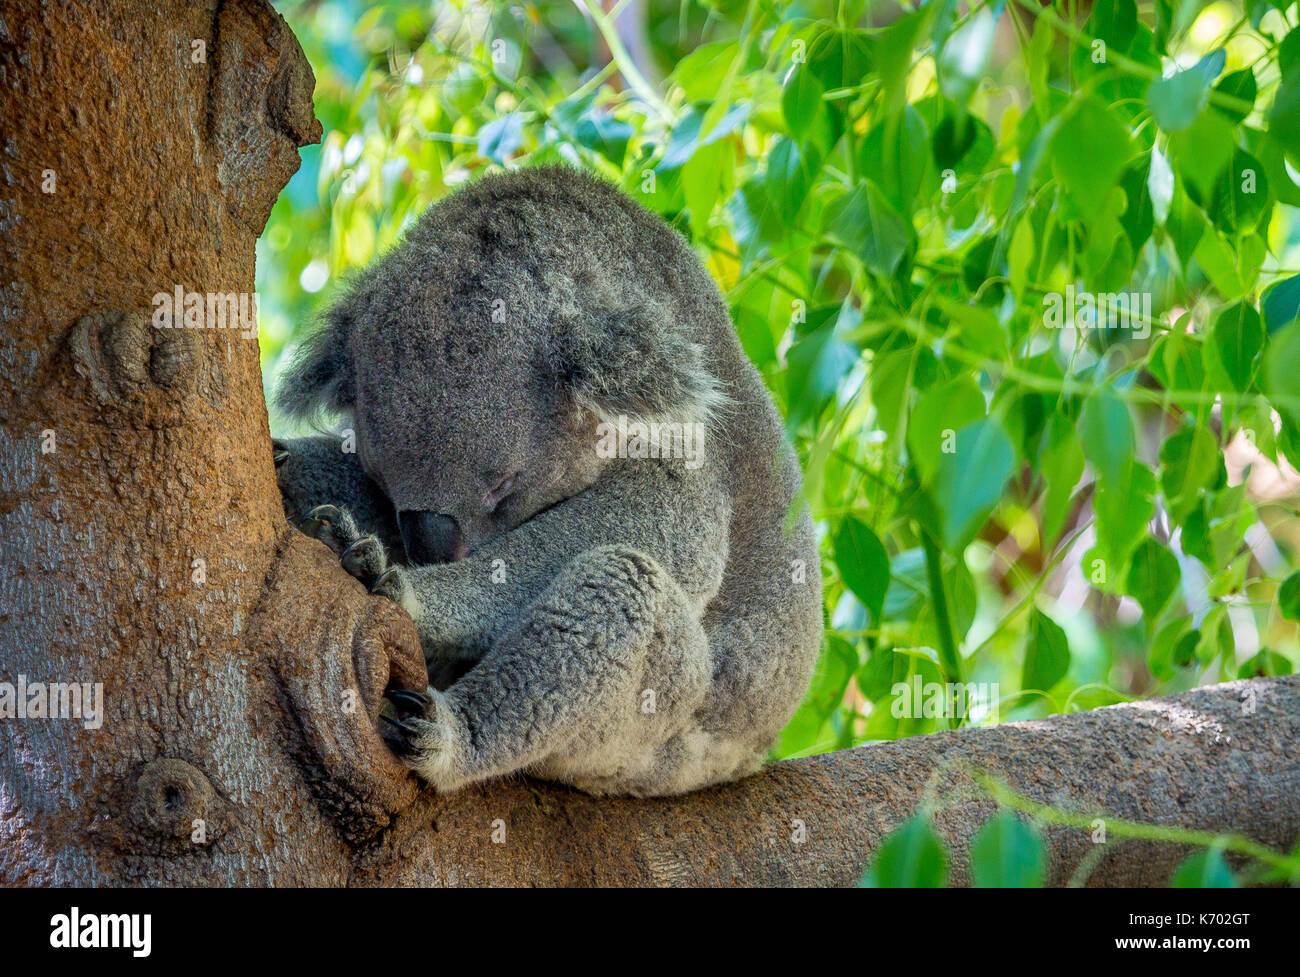 Koala bear naps - Stock Image